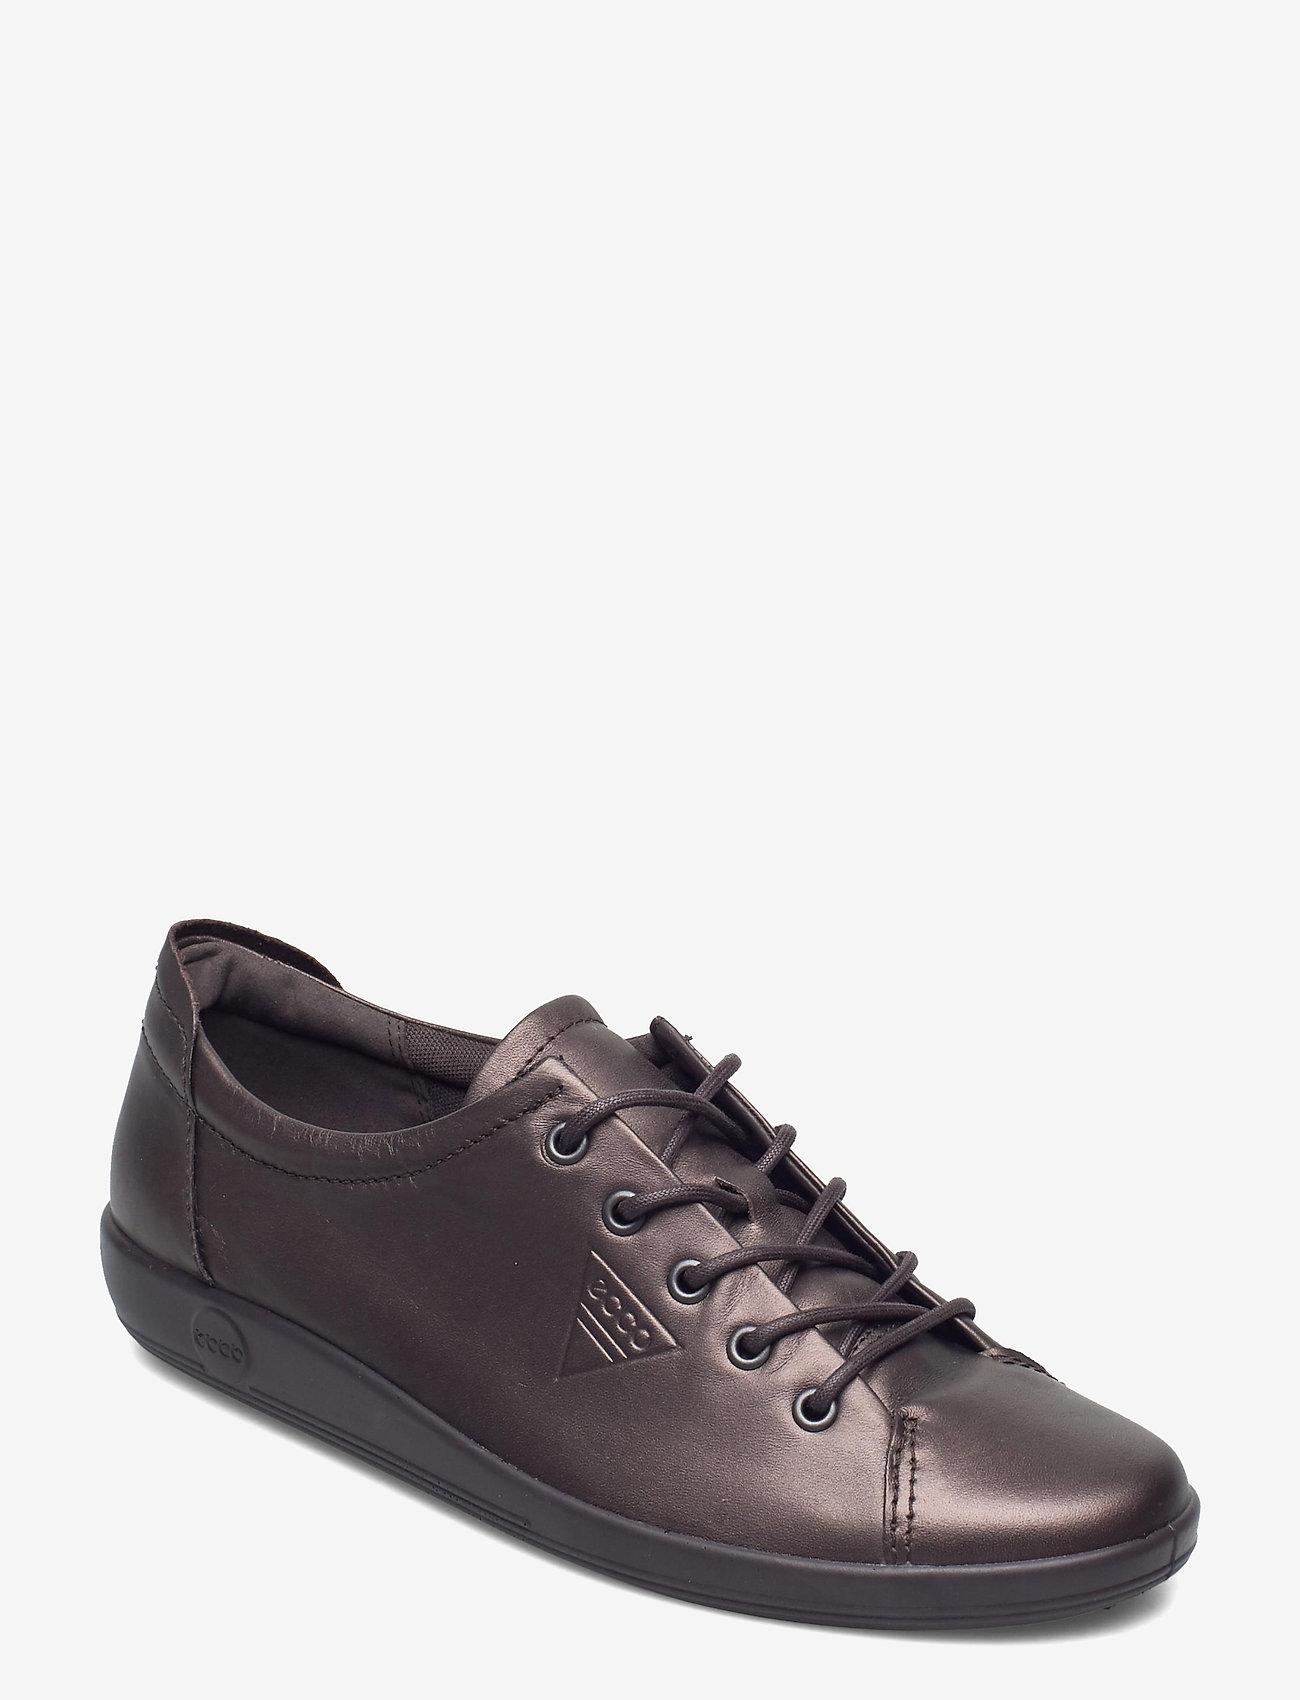 ECCO - SOFT 2.0 - låga sneakers - shale metallic - 0